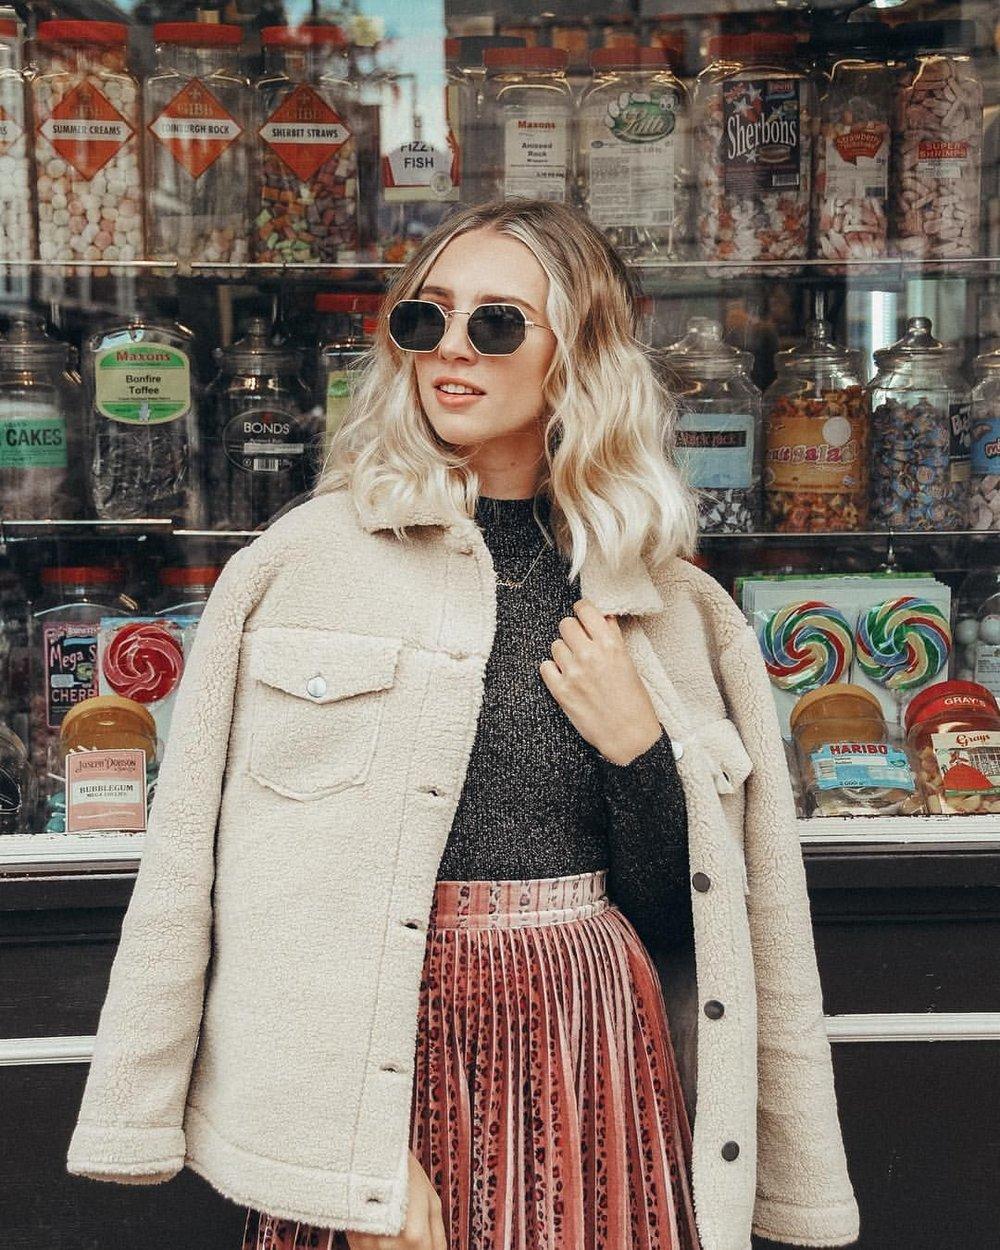 Robyn Poppy - Instagrammer, Fashion and Lifestyle Blogger